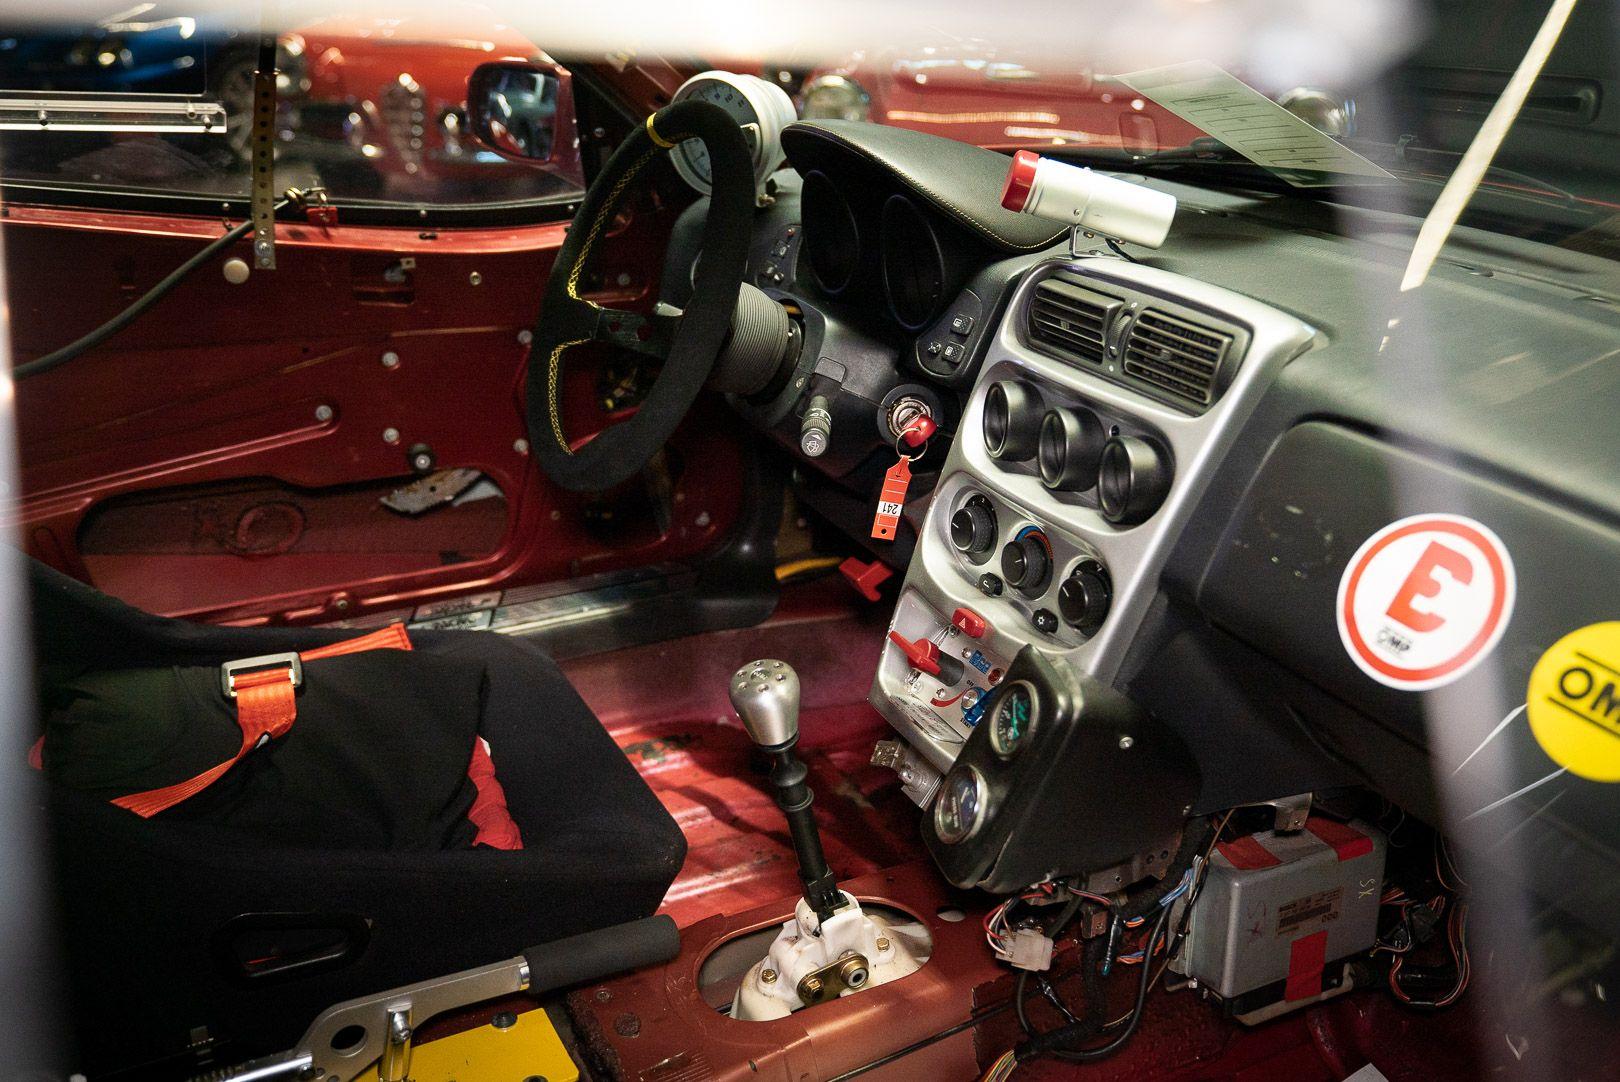 1995 Alfa Romeo GTV 2.0 V6 Turbo Cup Replica 59908